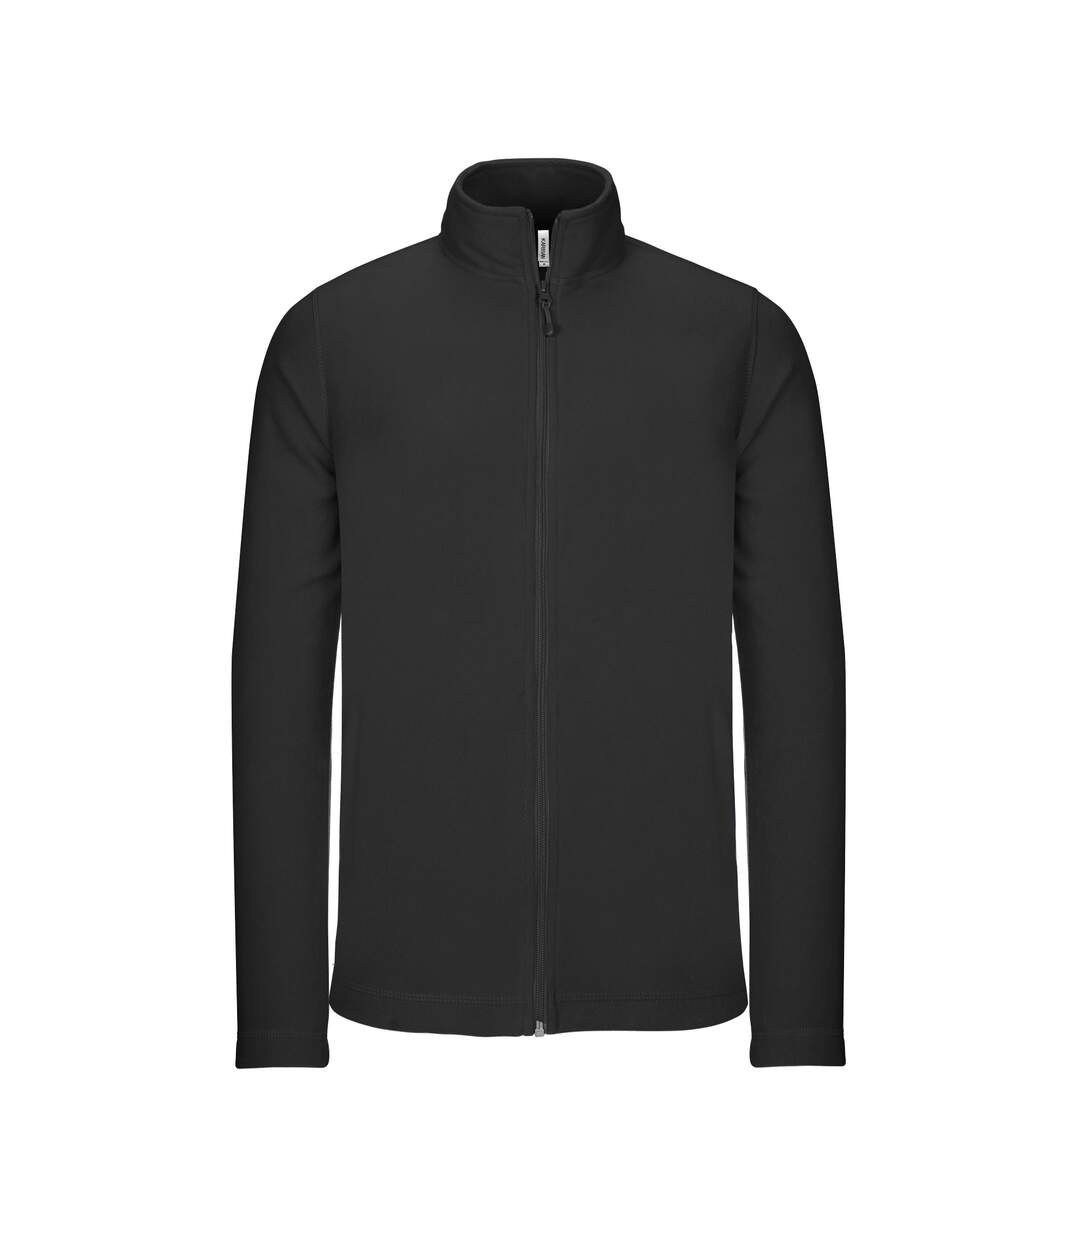 Kariban Mens Full Zip Microfleece Jacket (Black) - UTRW5625